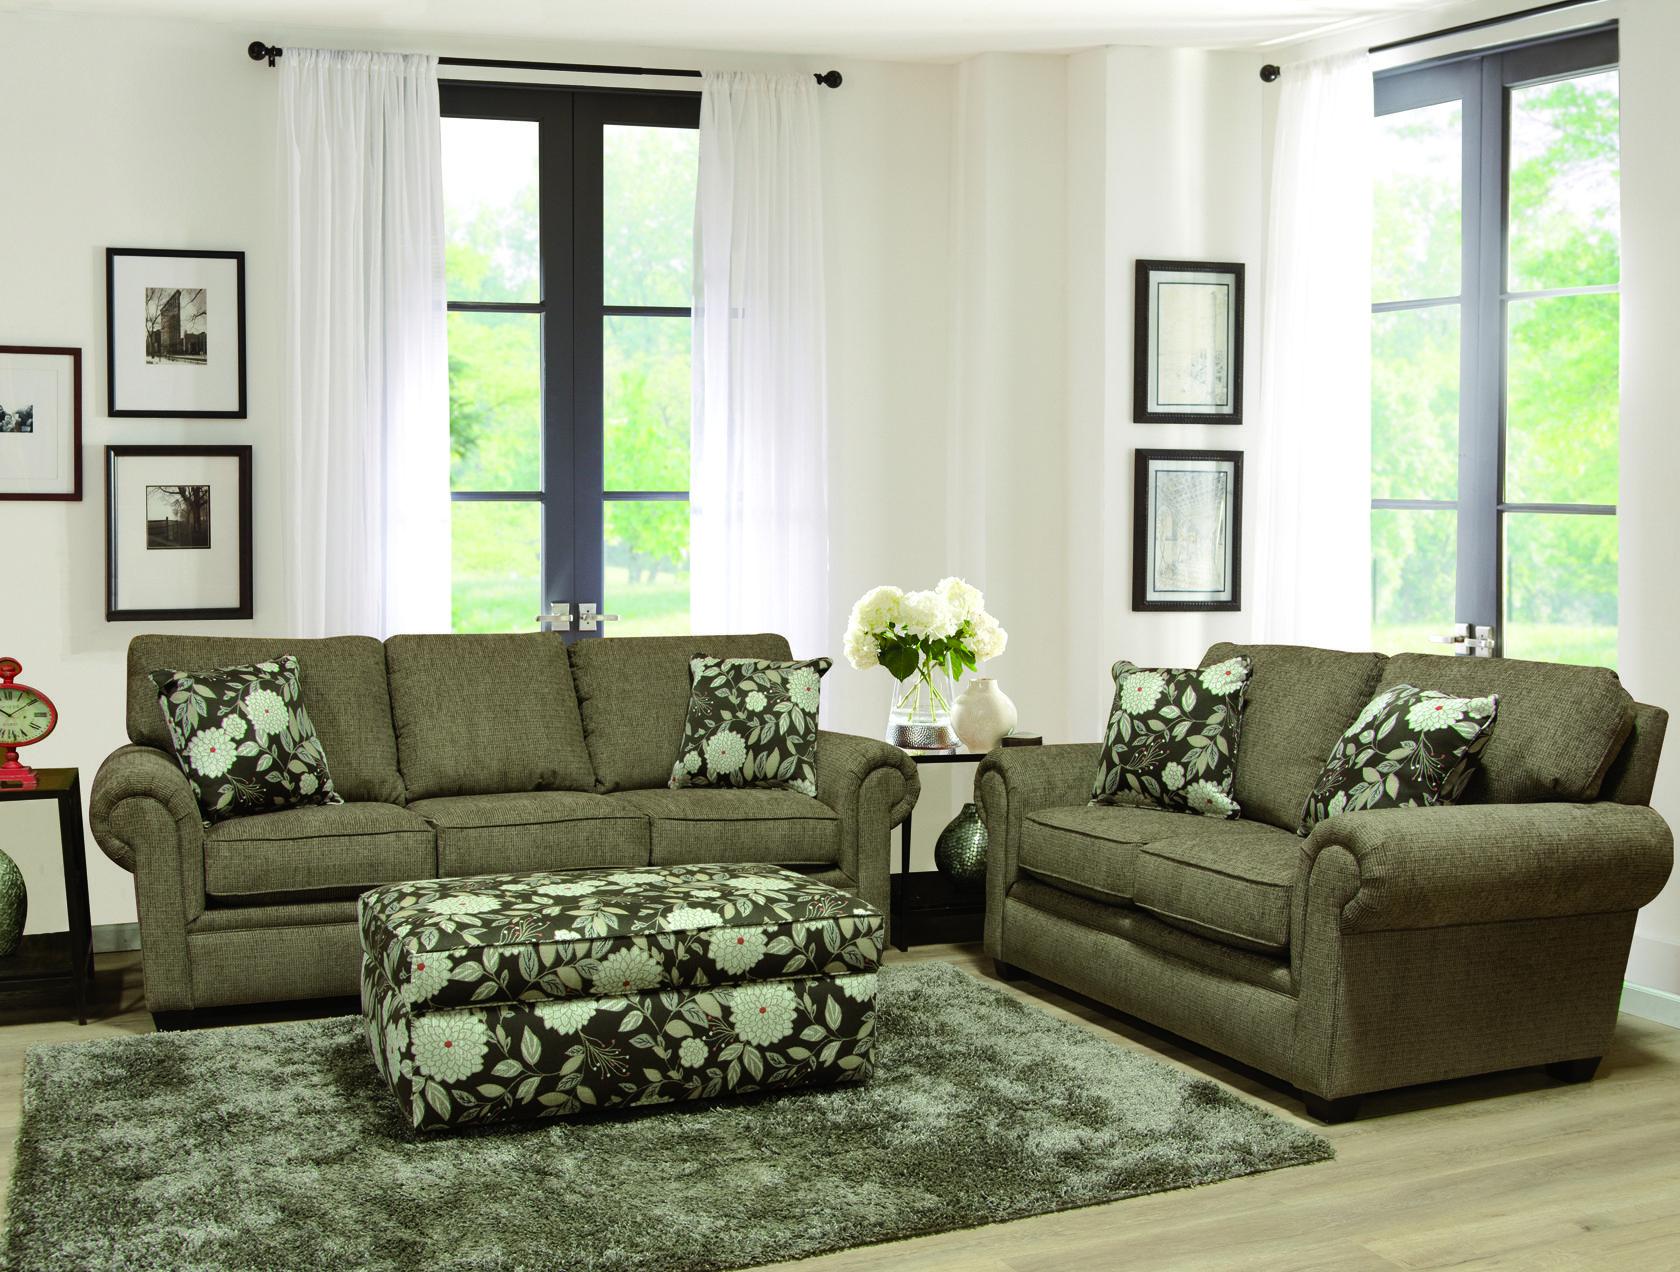 England Furniture 2255, 2256, 240081 in Cherry Pie Steele